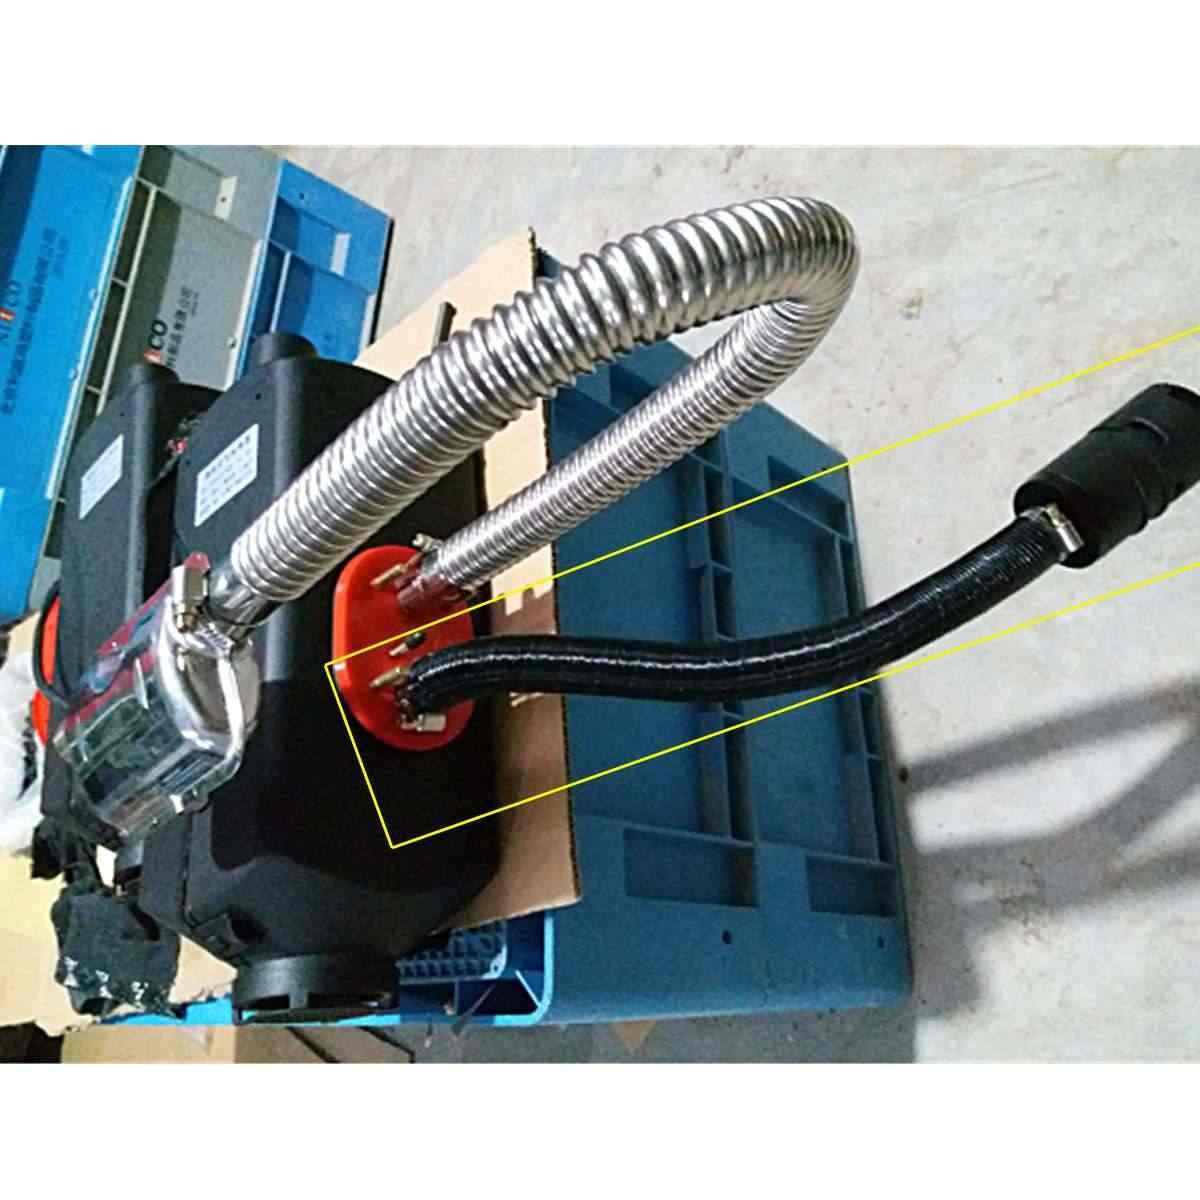 Autoleader 3 個フィルター燃焼空気パイプ用 12V 5KW 自動車ヒーター吸気ホース管出口排気ダクト空気システム